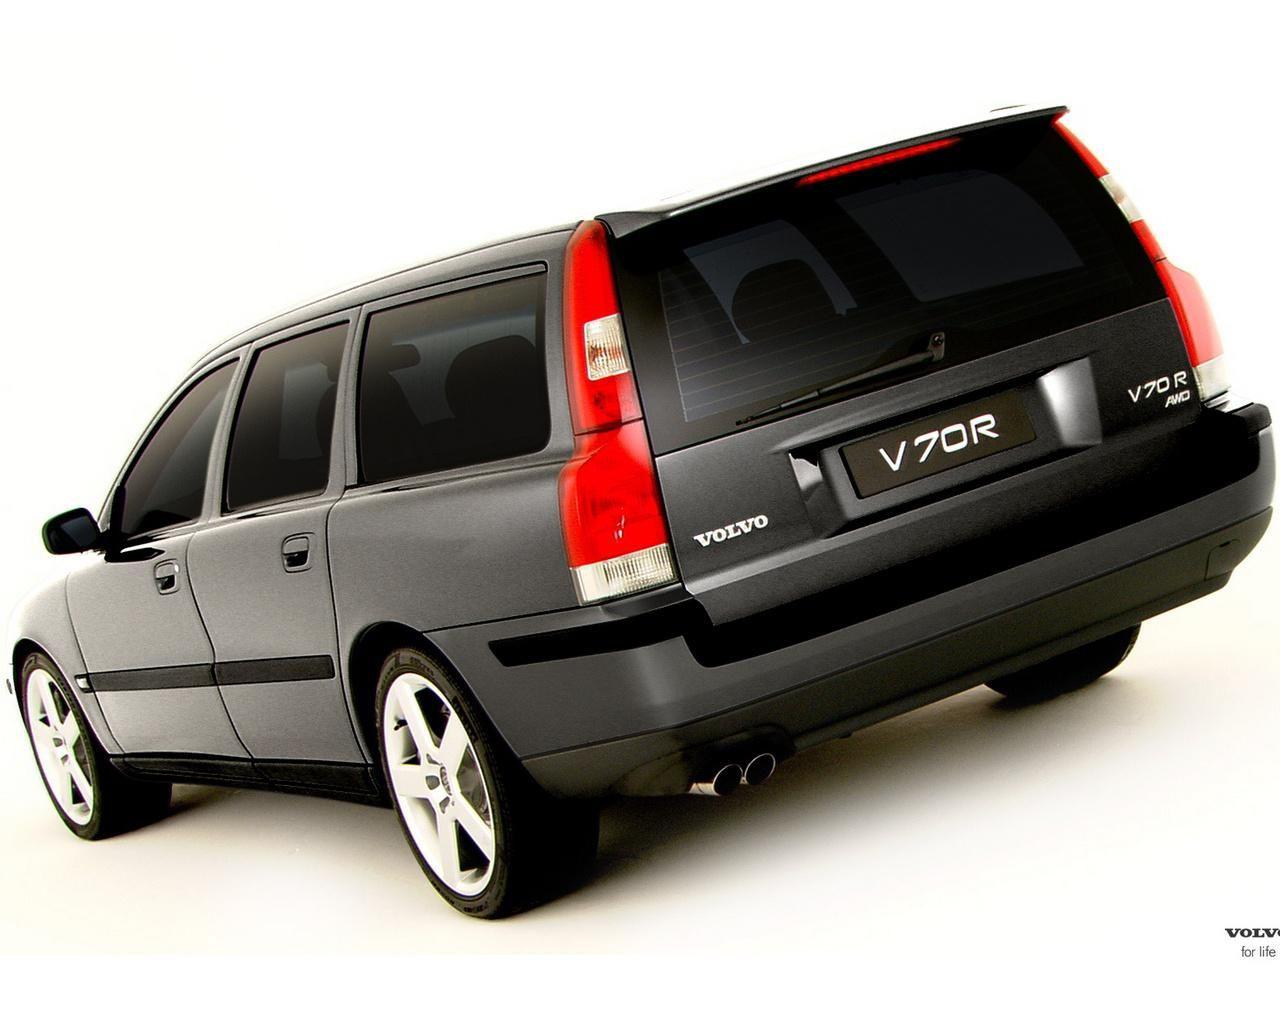 Volvo v70 r hd wallpaper http 1sthdwallpapers com volvo